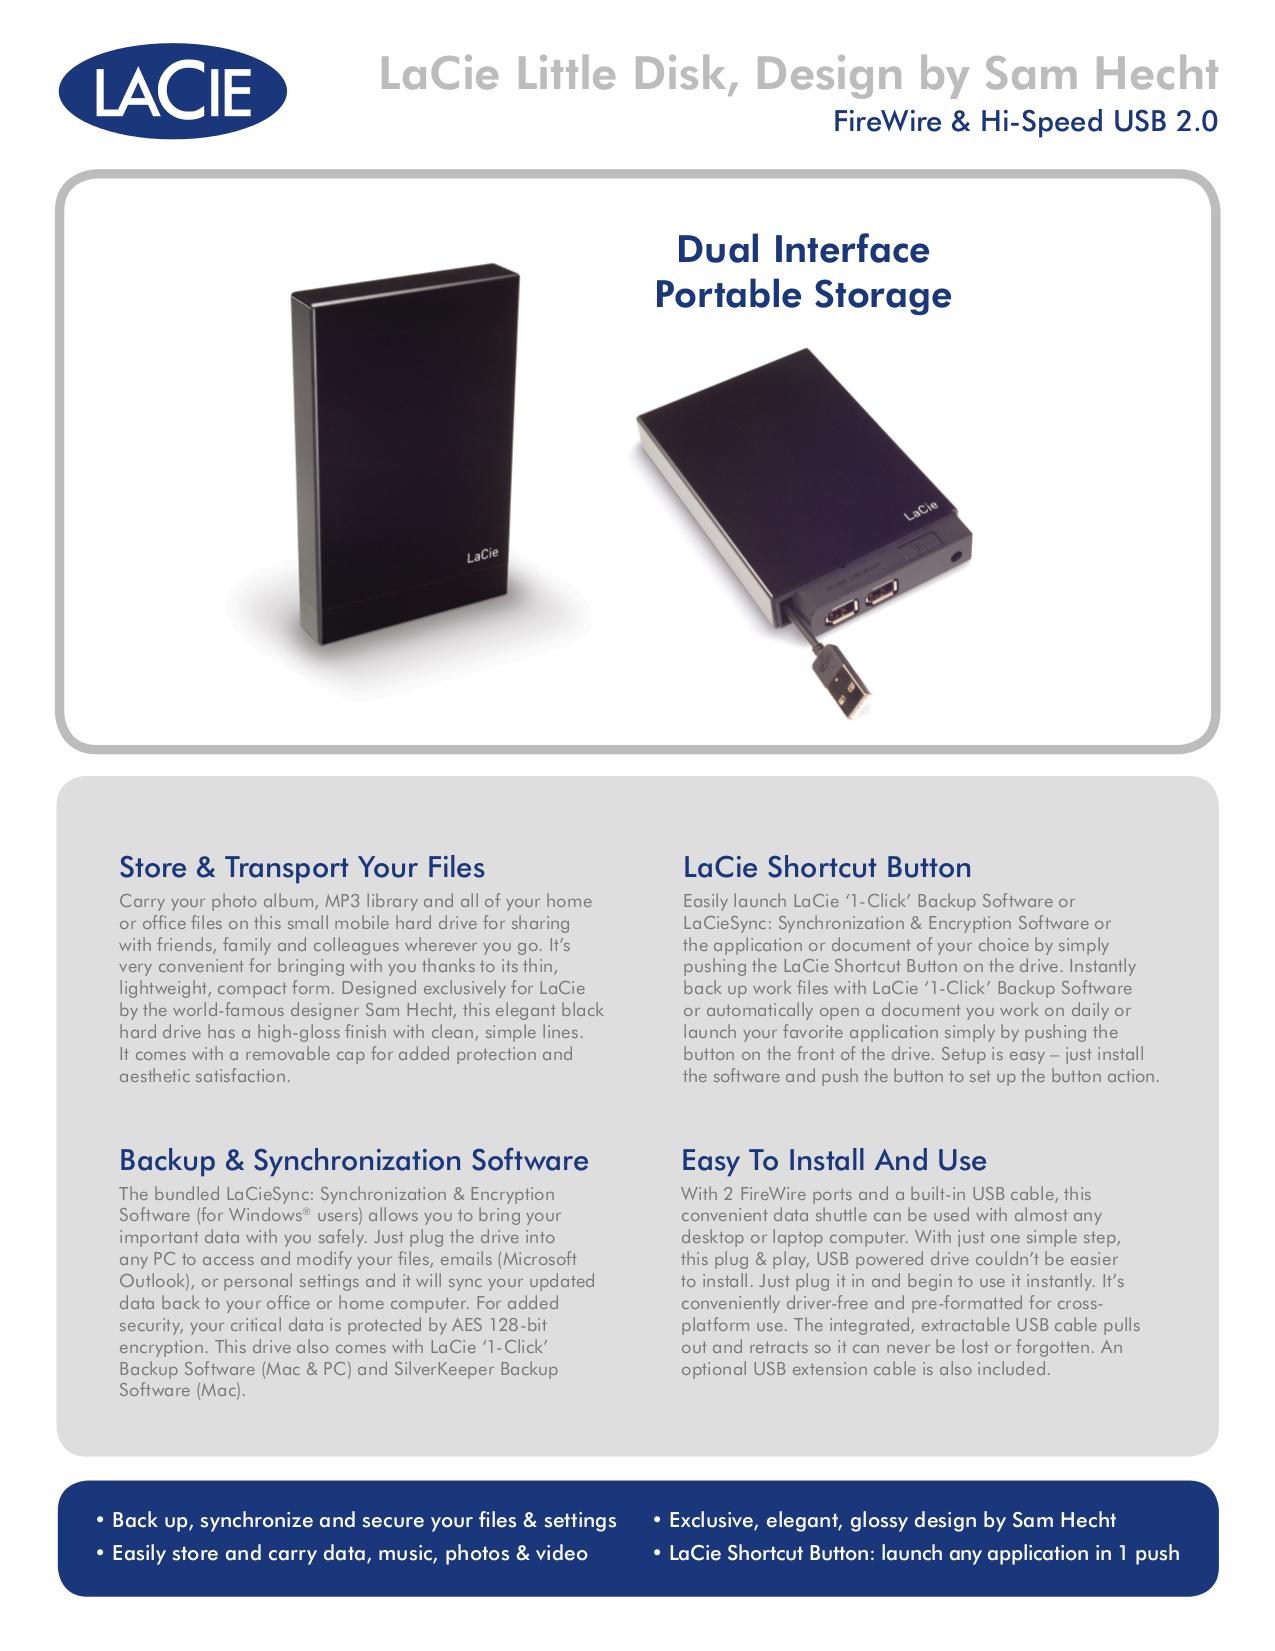 pdf for LaCie Storage 301280 manual